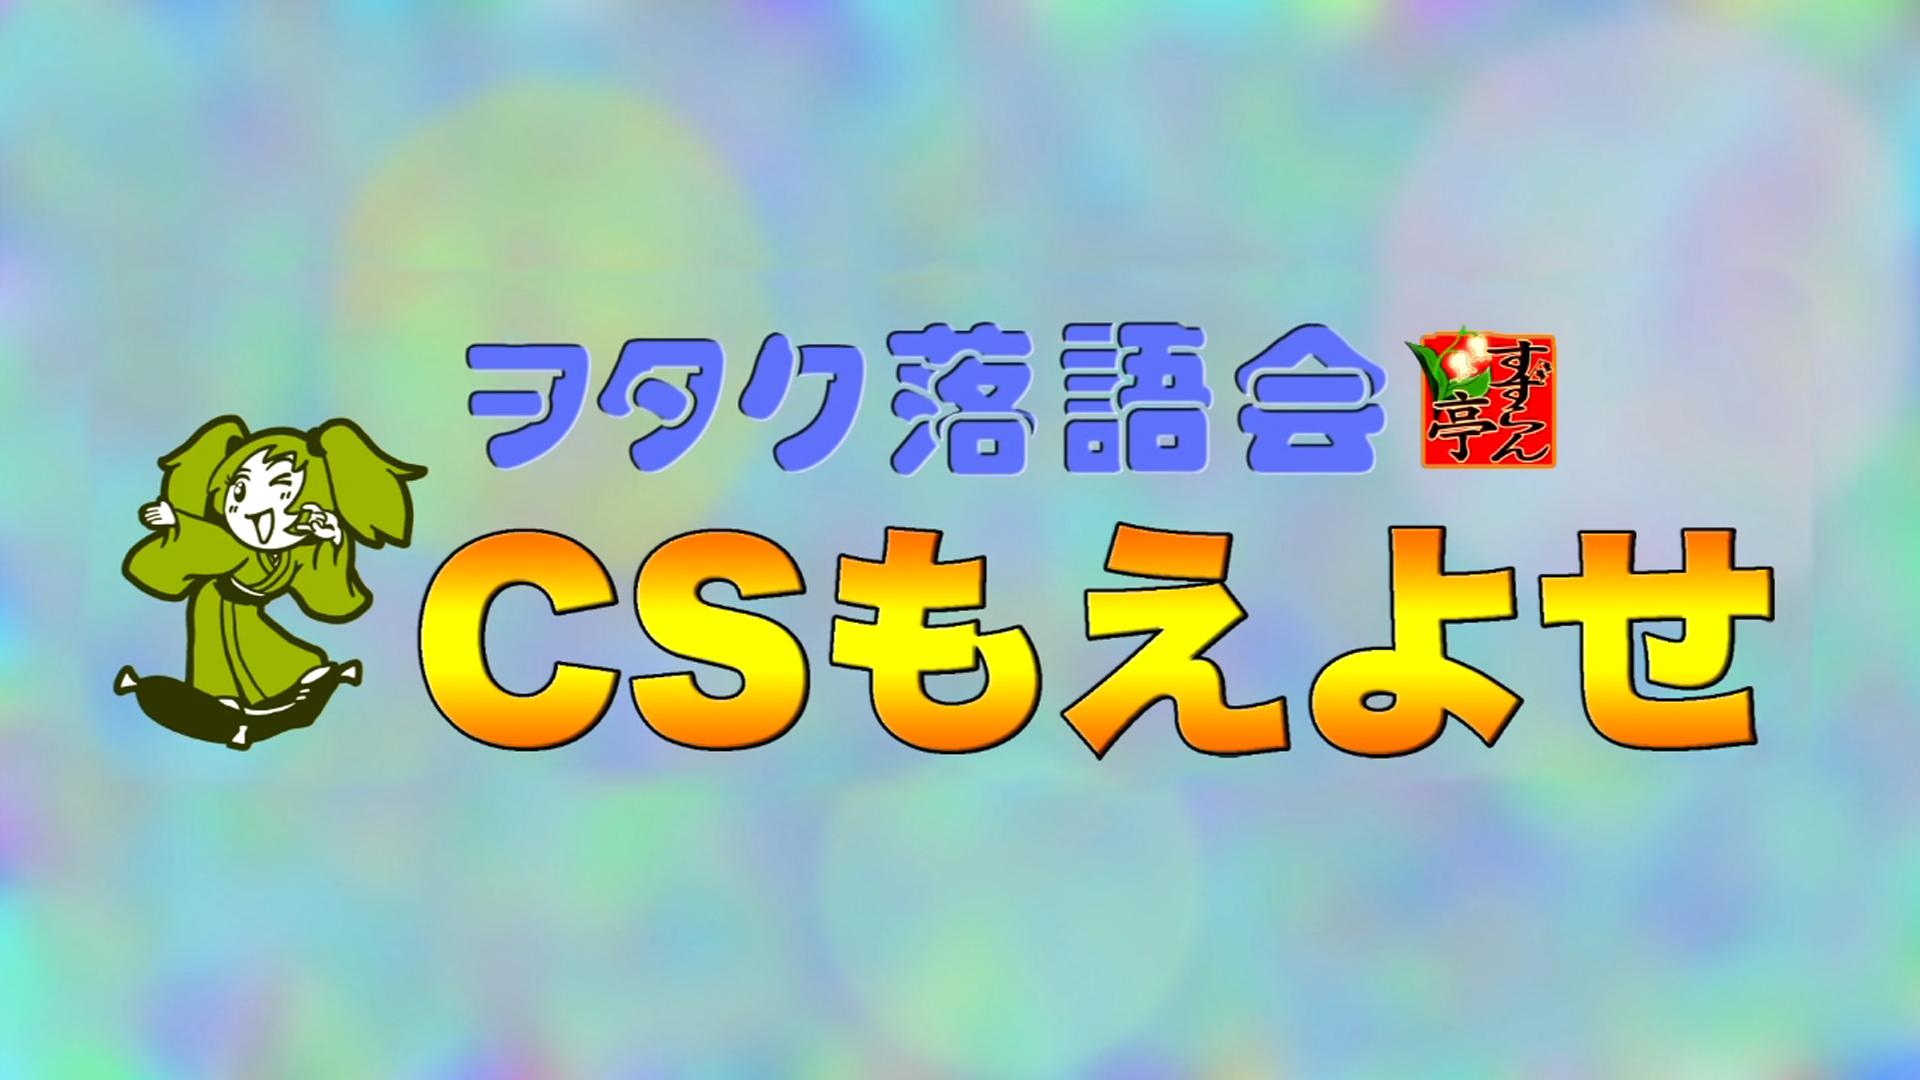 CSもえよせ 春風亭吉好のヲタク落語会~すずらん亭~【寄席チャンネルSELECT】